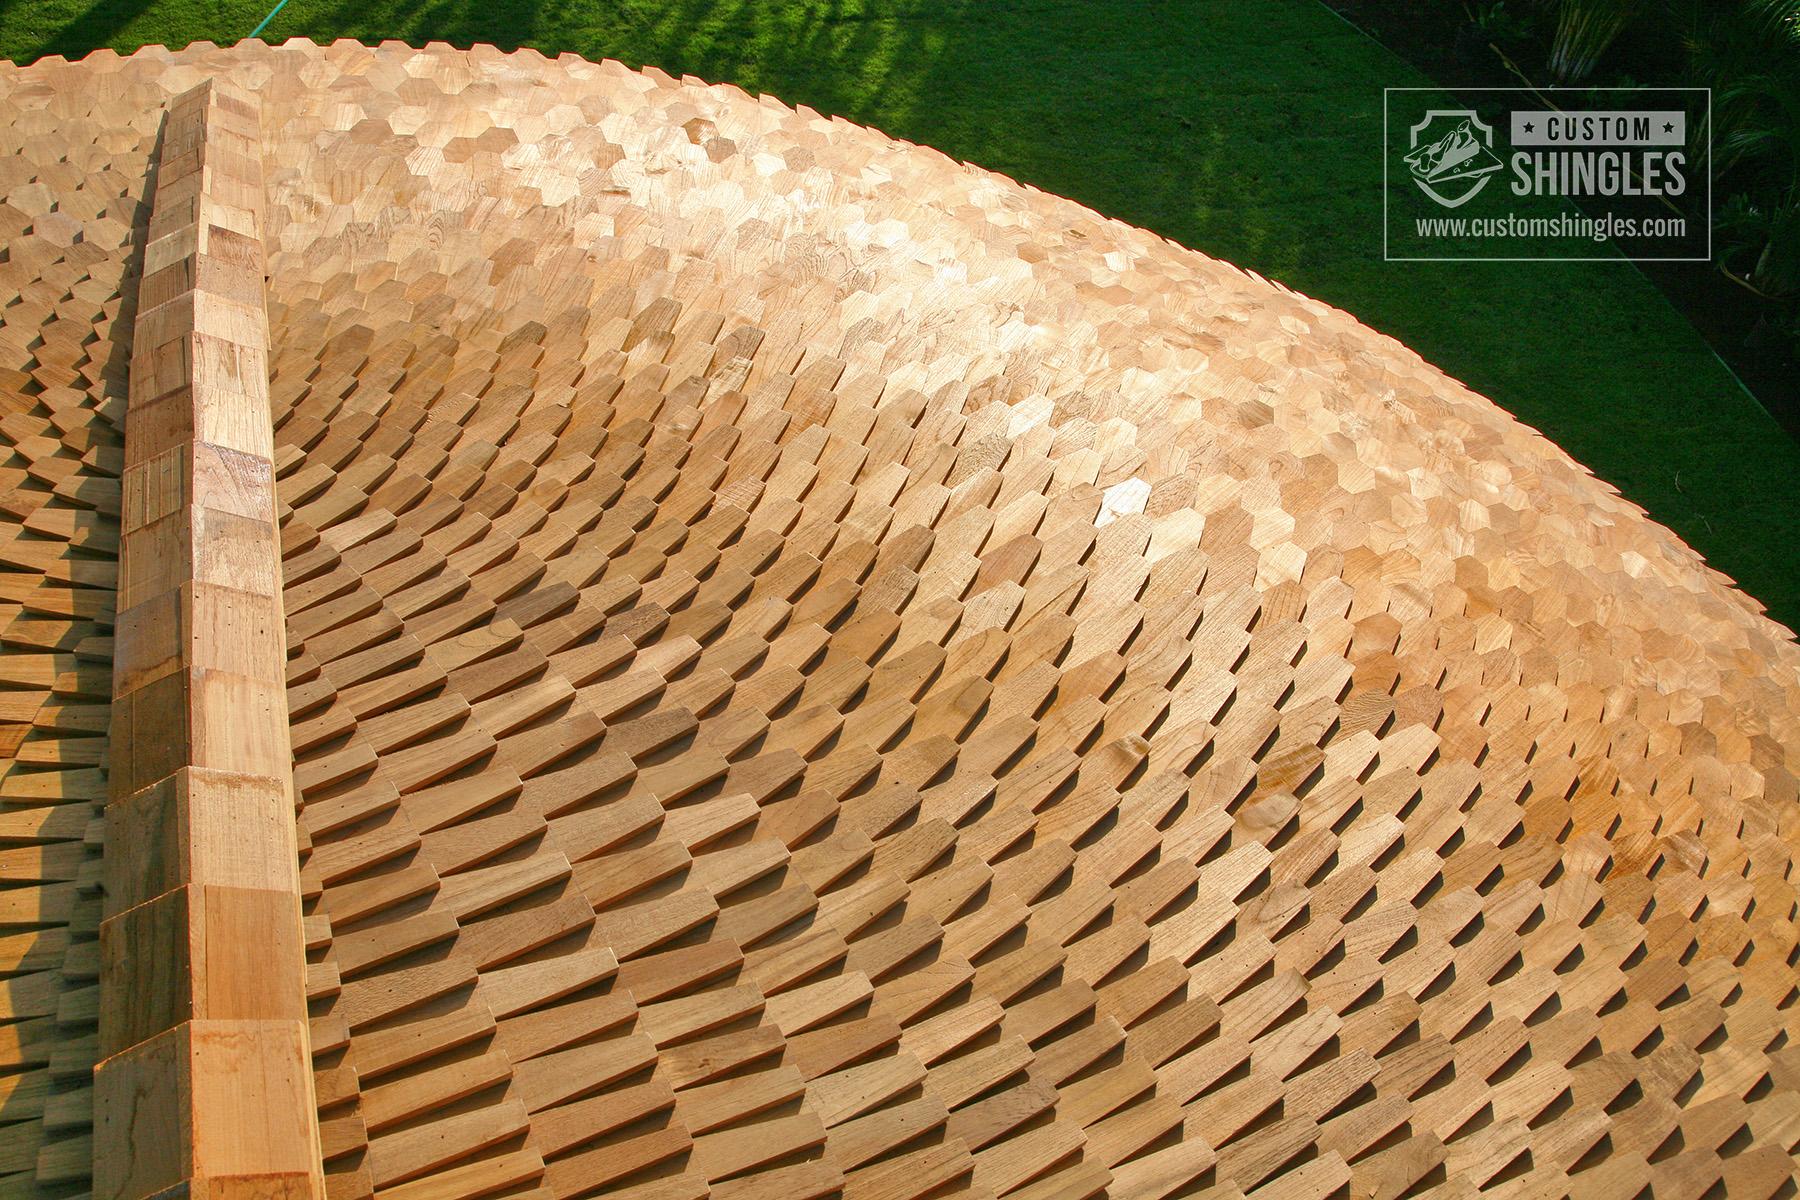 Exotic-Teak-Roofing-Shingles-Custom-Cut-and-Steam-Bent-(1) copy.jpg